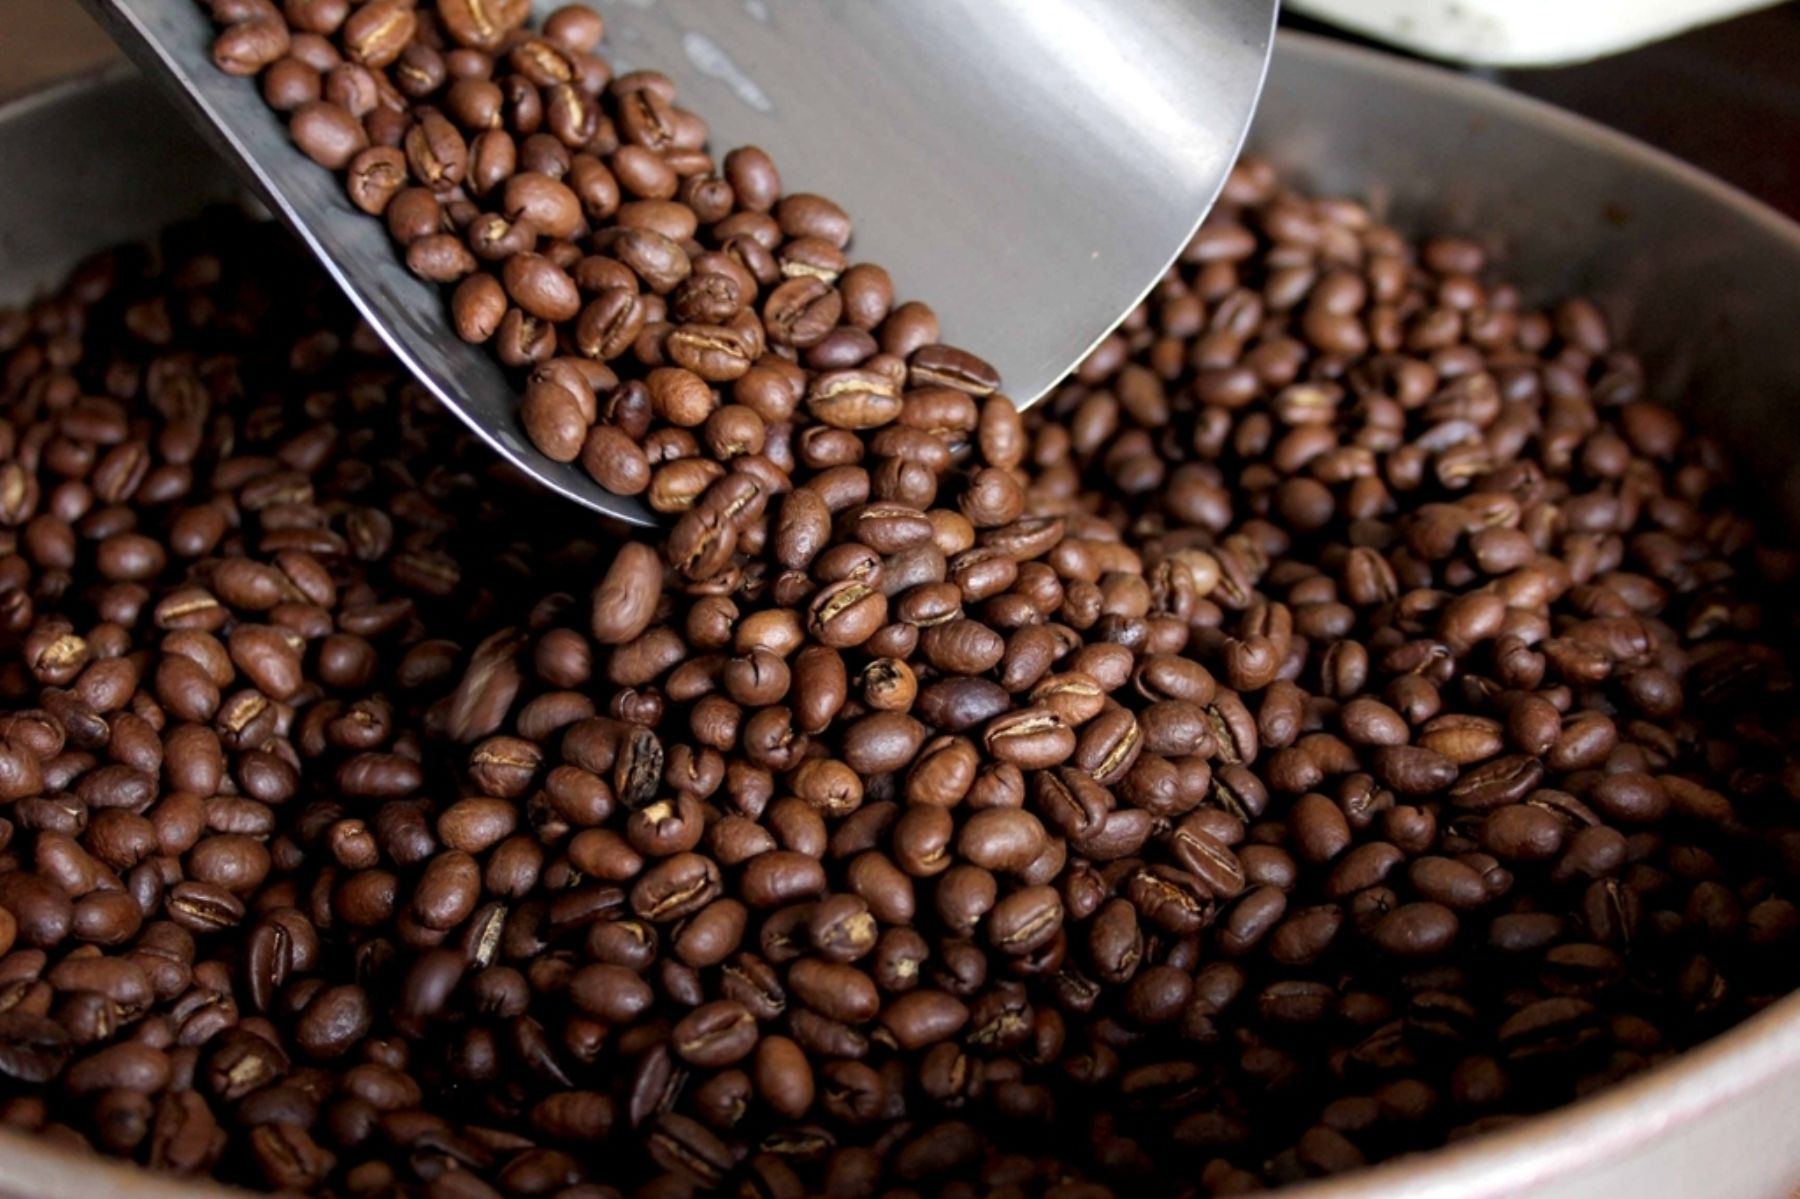 Se incrementa demanda de café peruano en Asia. ANDINA/Difusión